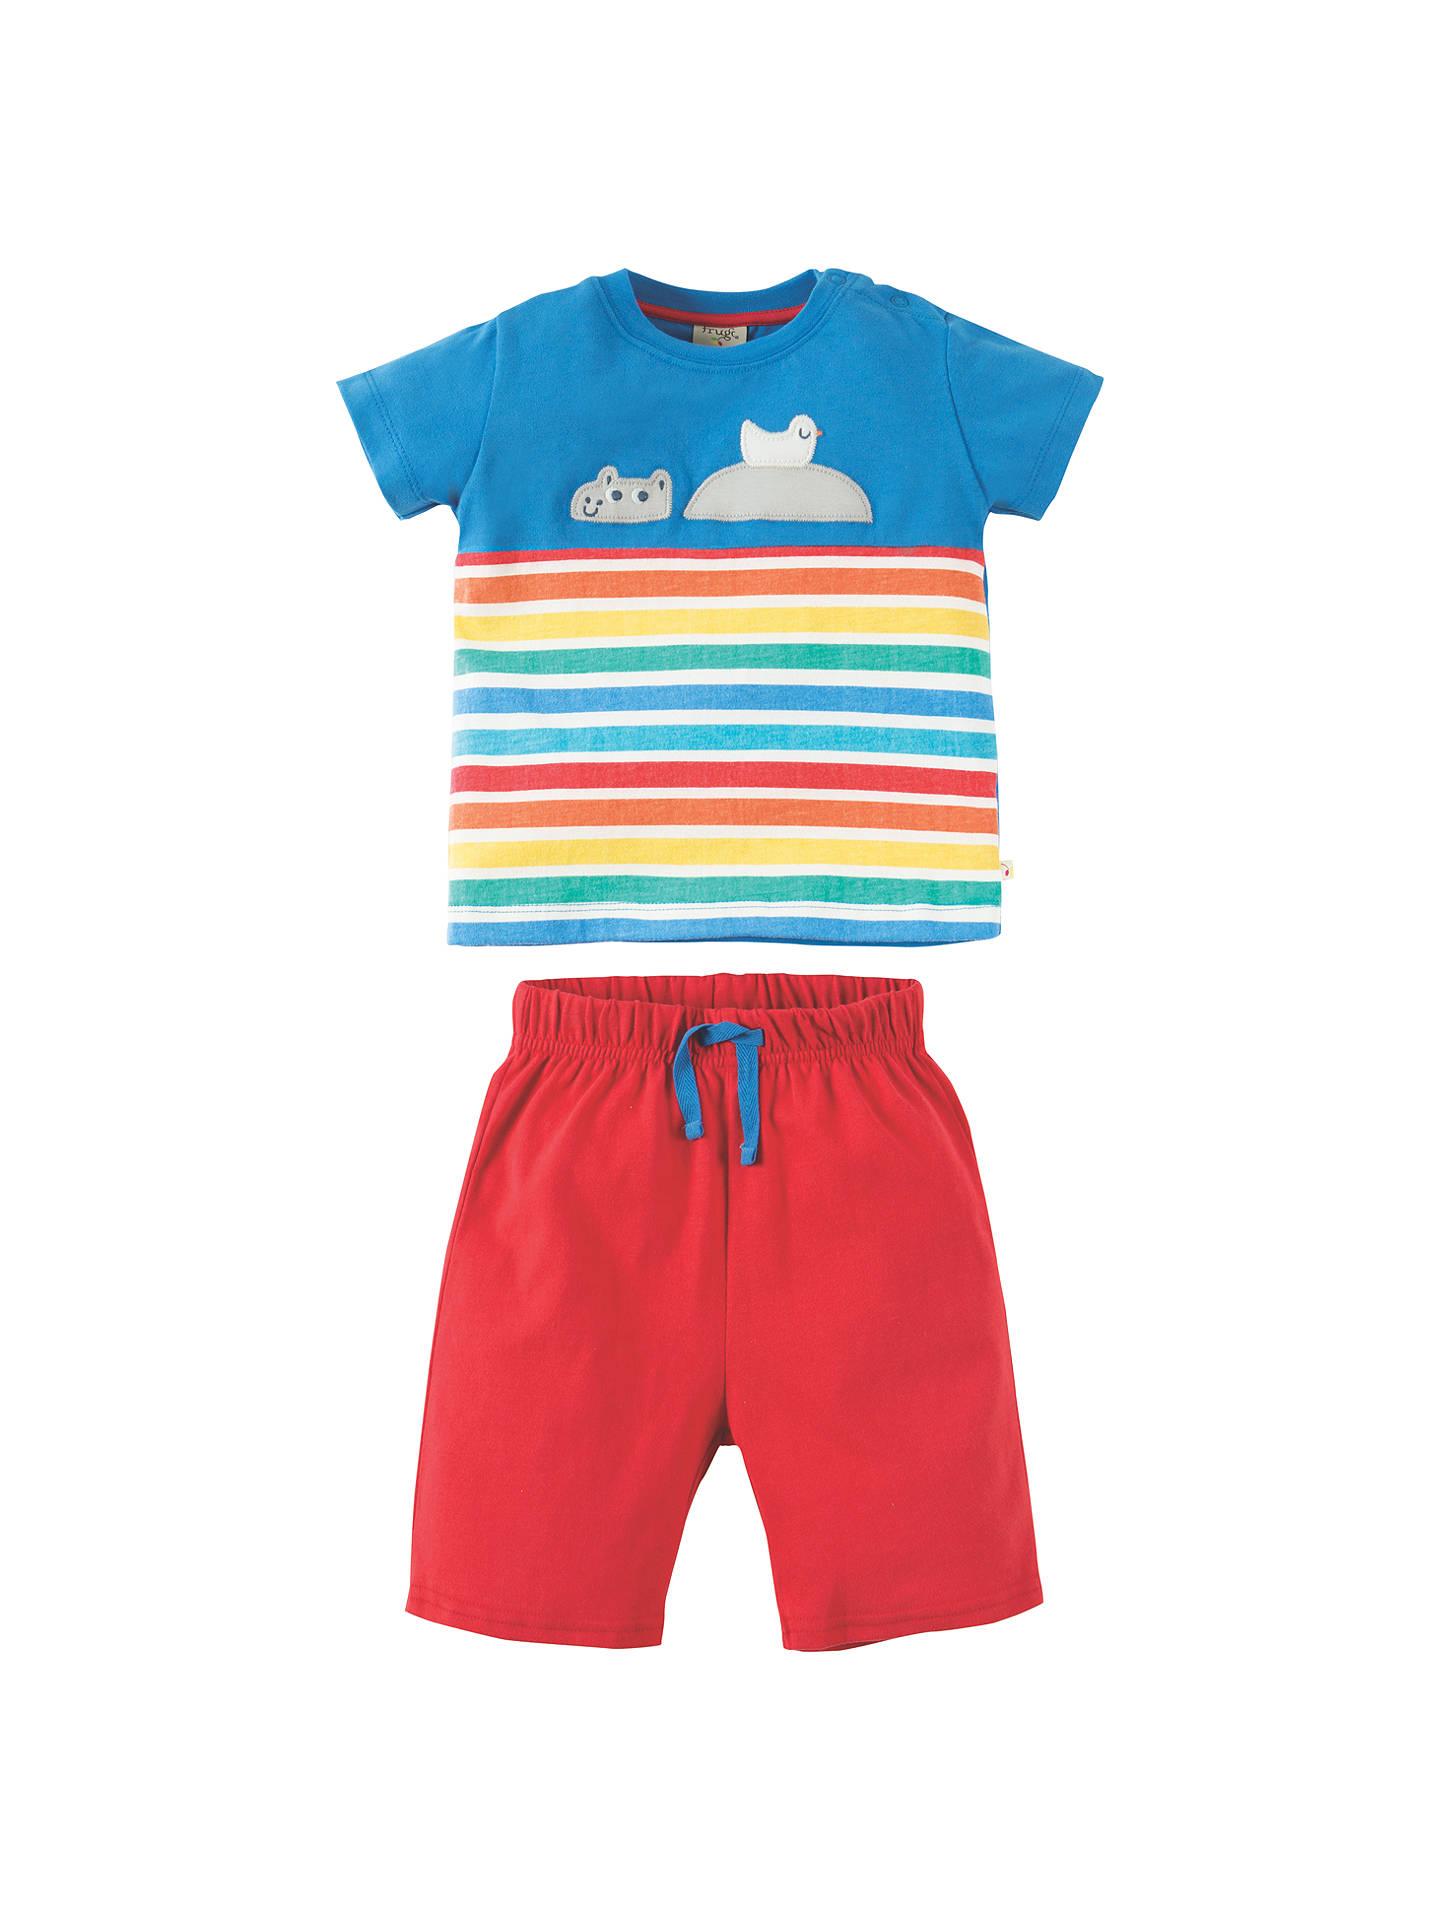 4f9f1bcd723c7 Frugi Organic Baby Hippo Rainbow Top & Shorts Set, Blue/Red at John ...